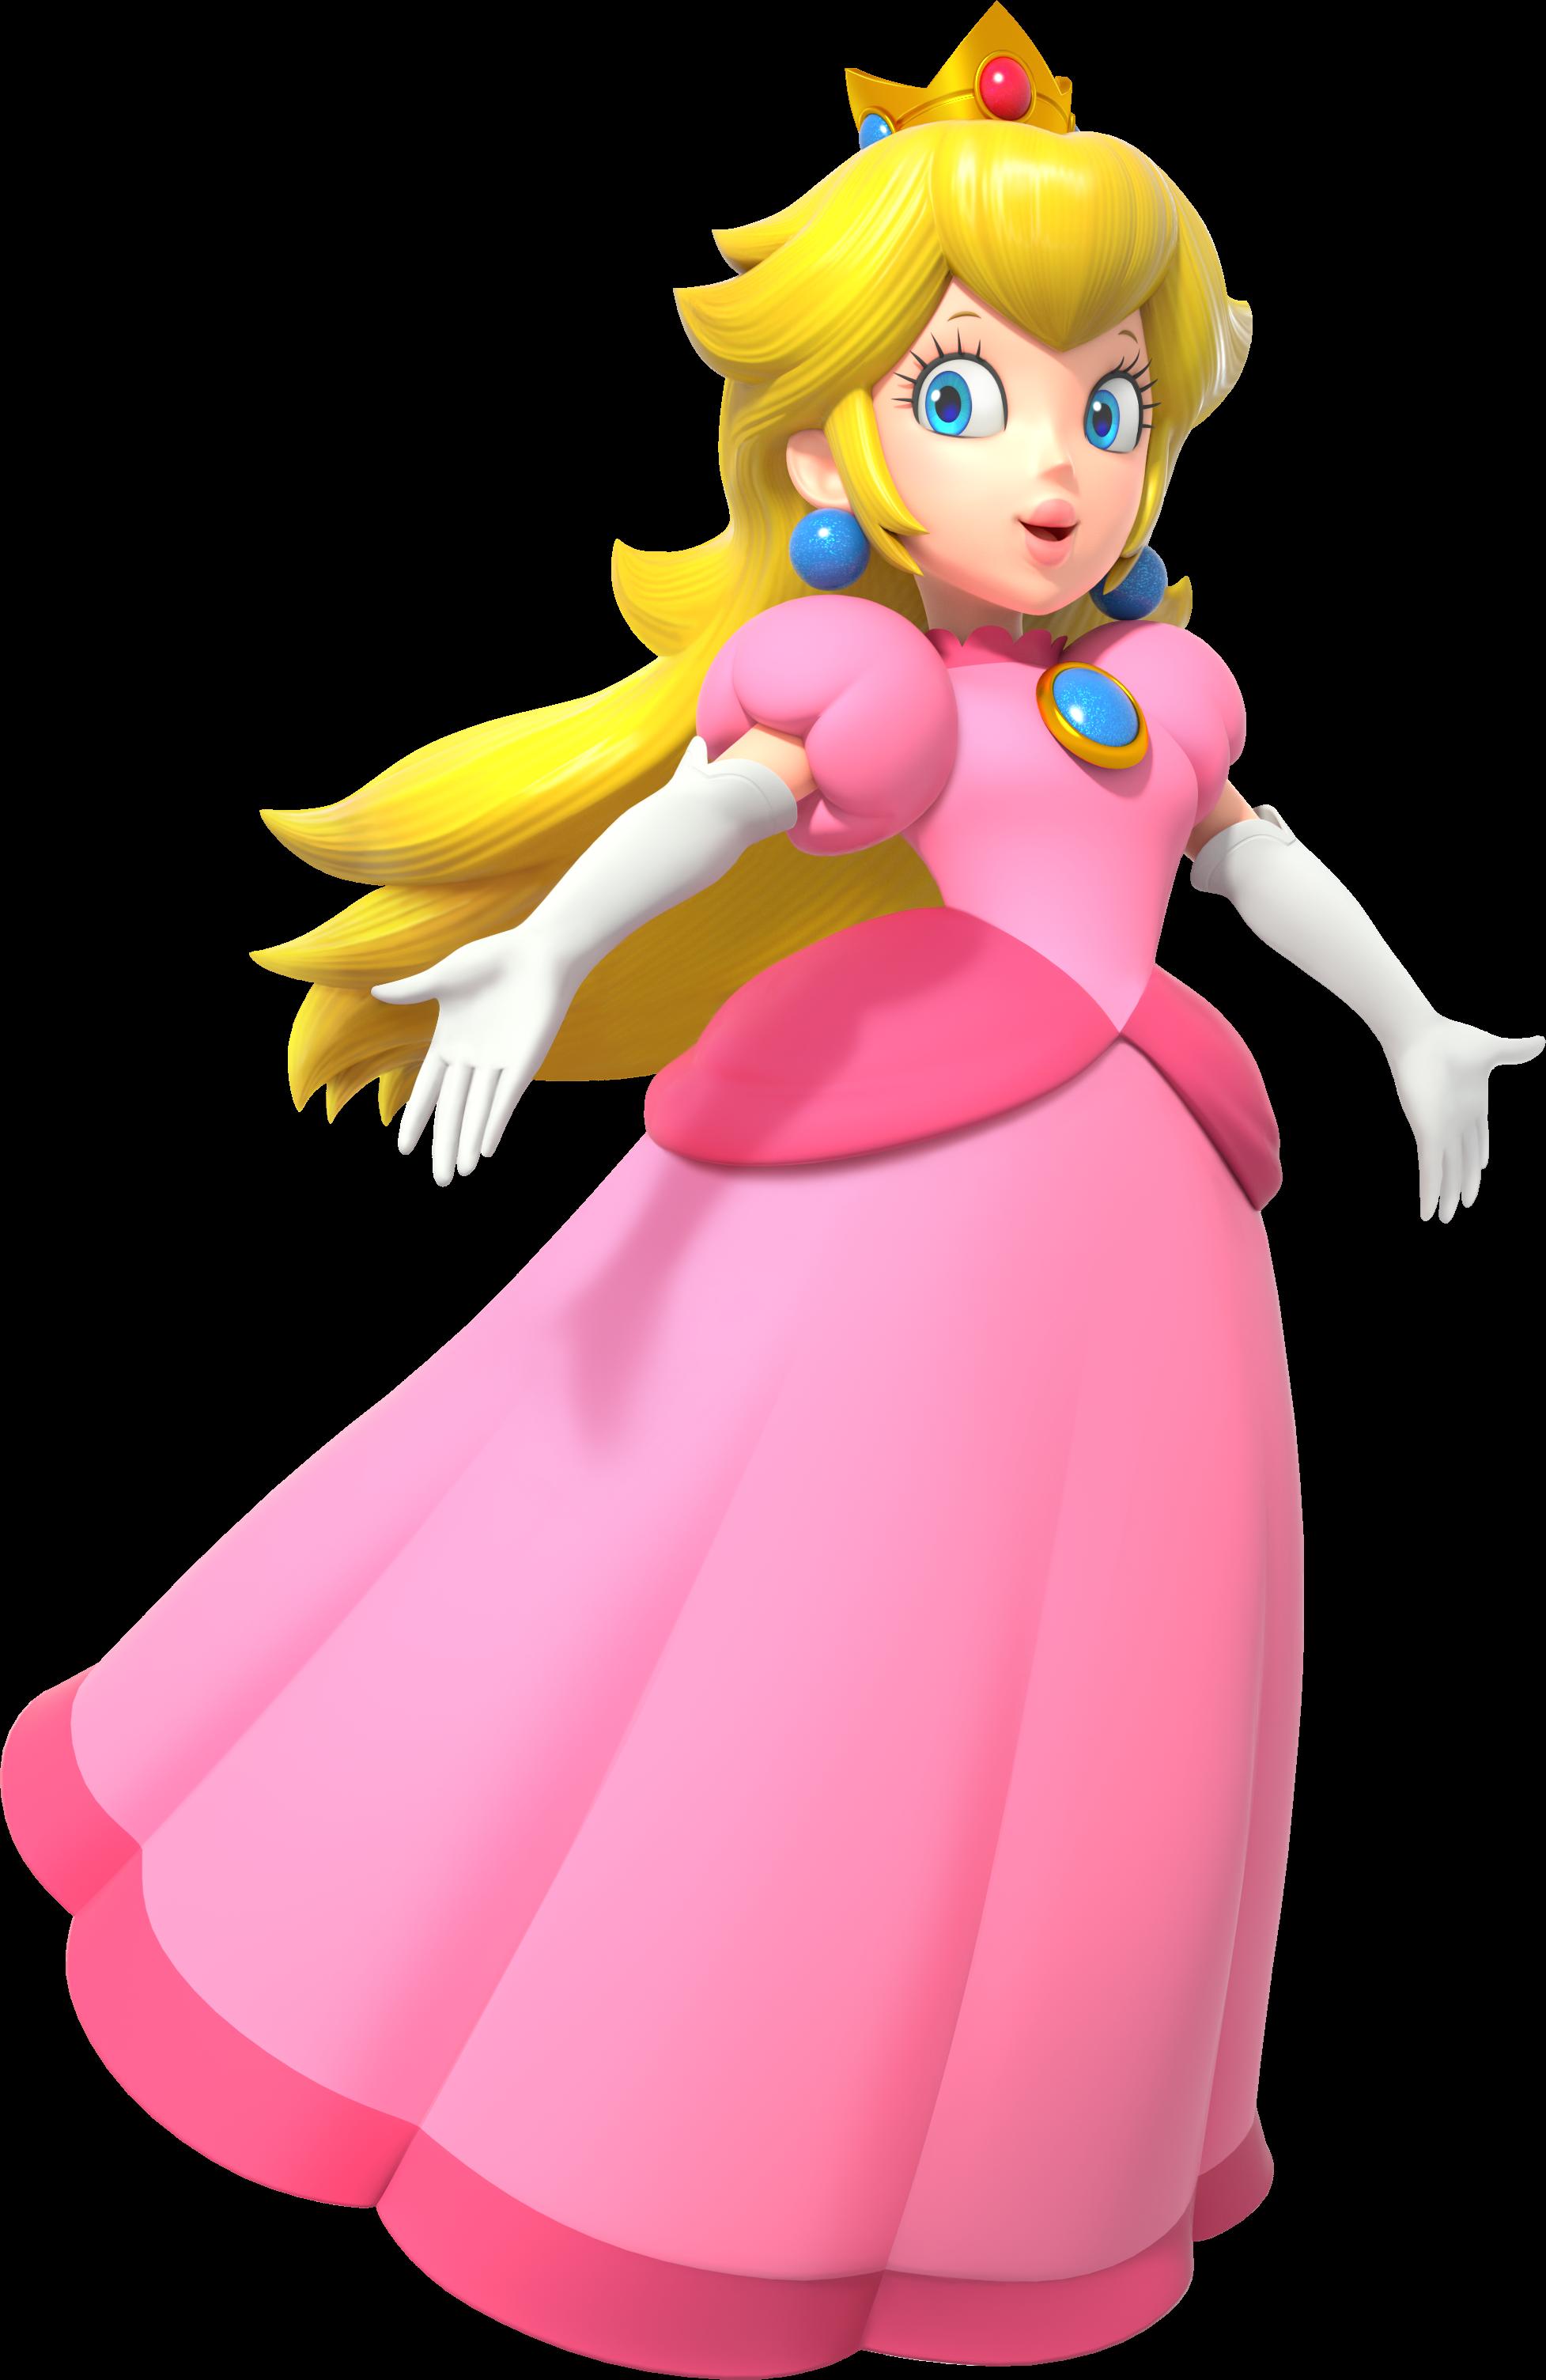 Top 10 Mario Characters - Princess Peach